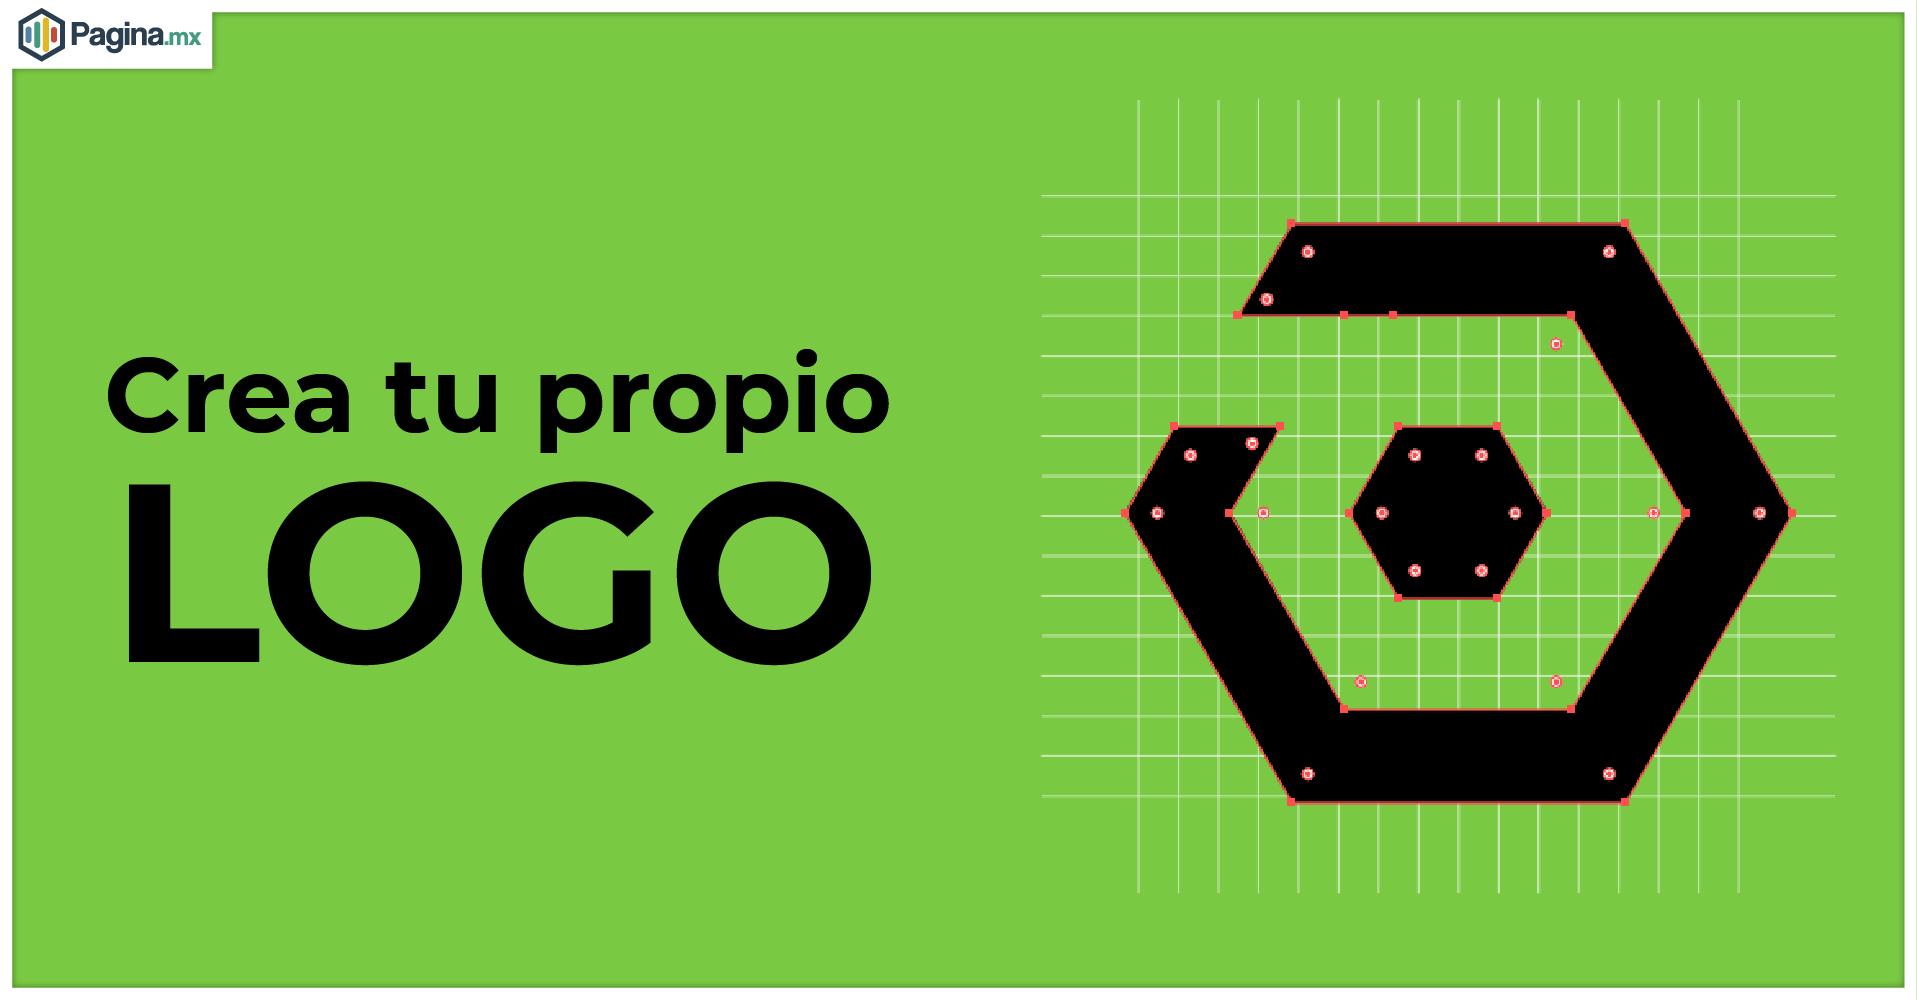 Imagen de portada, crea tu propio logo